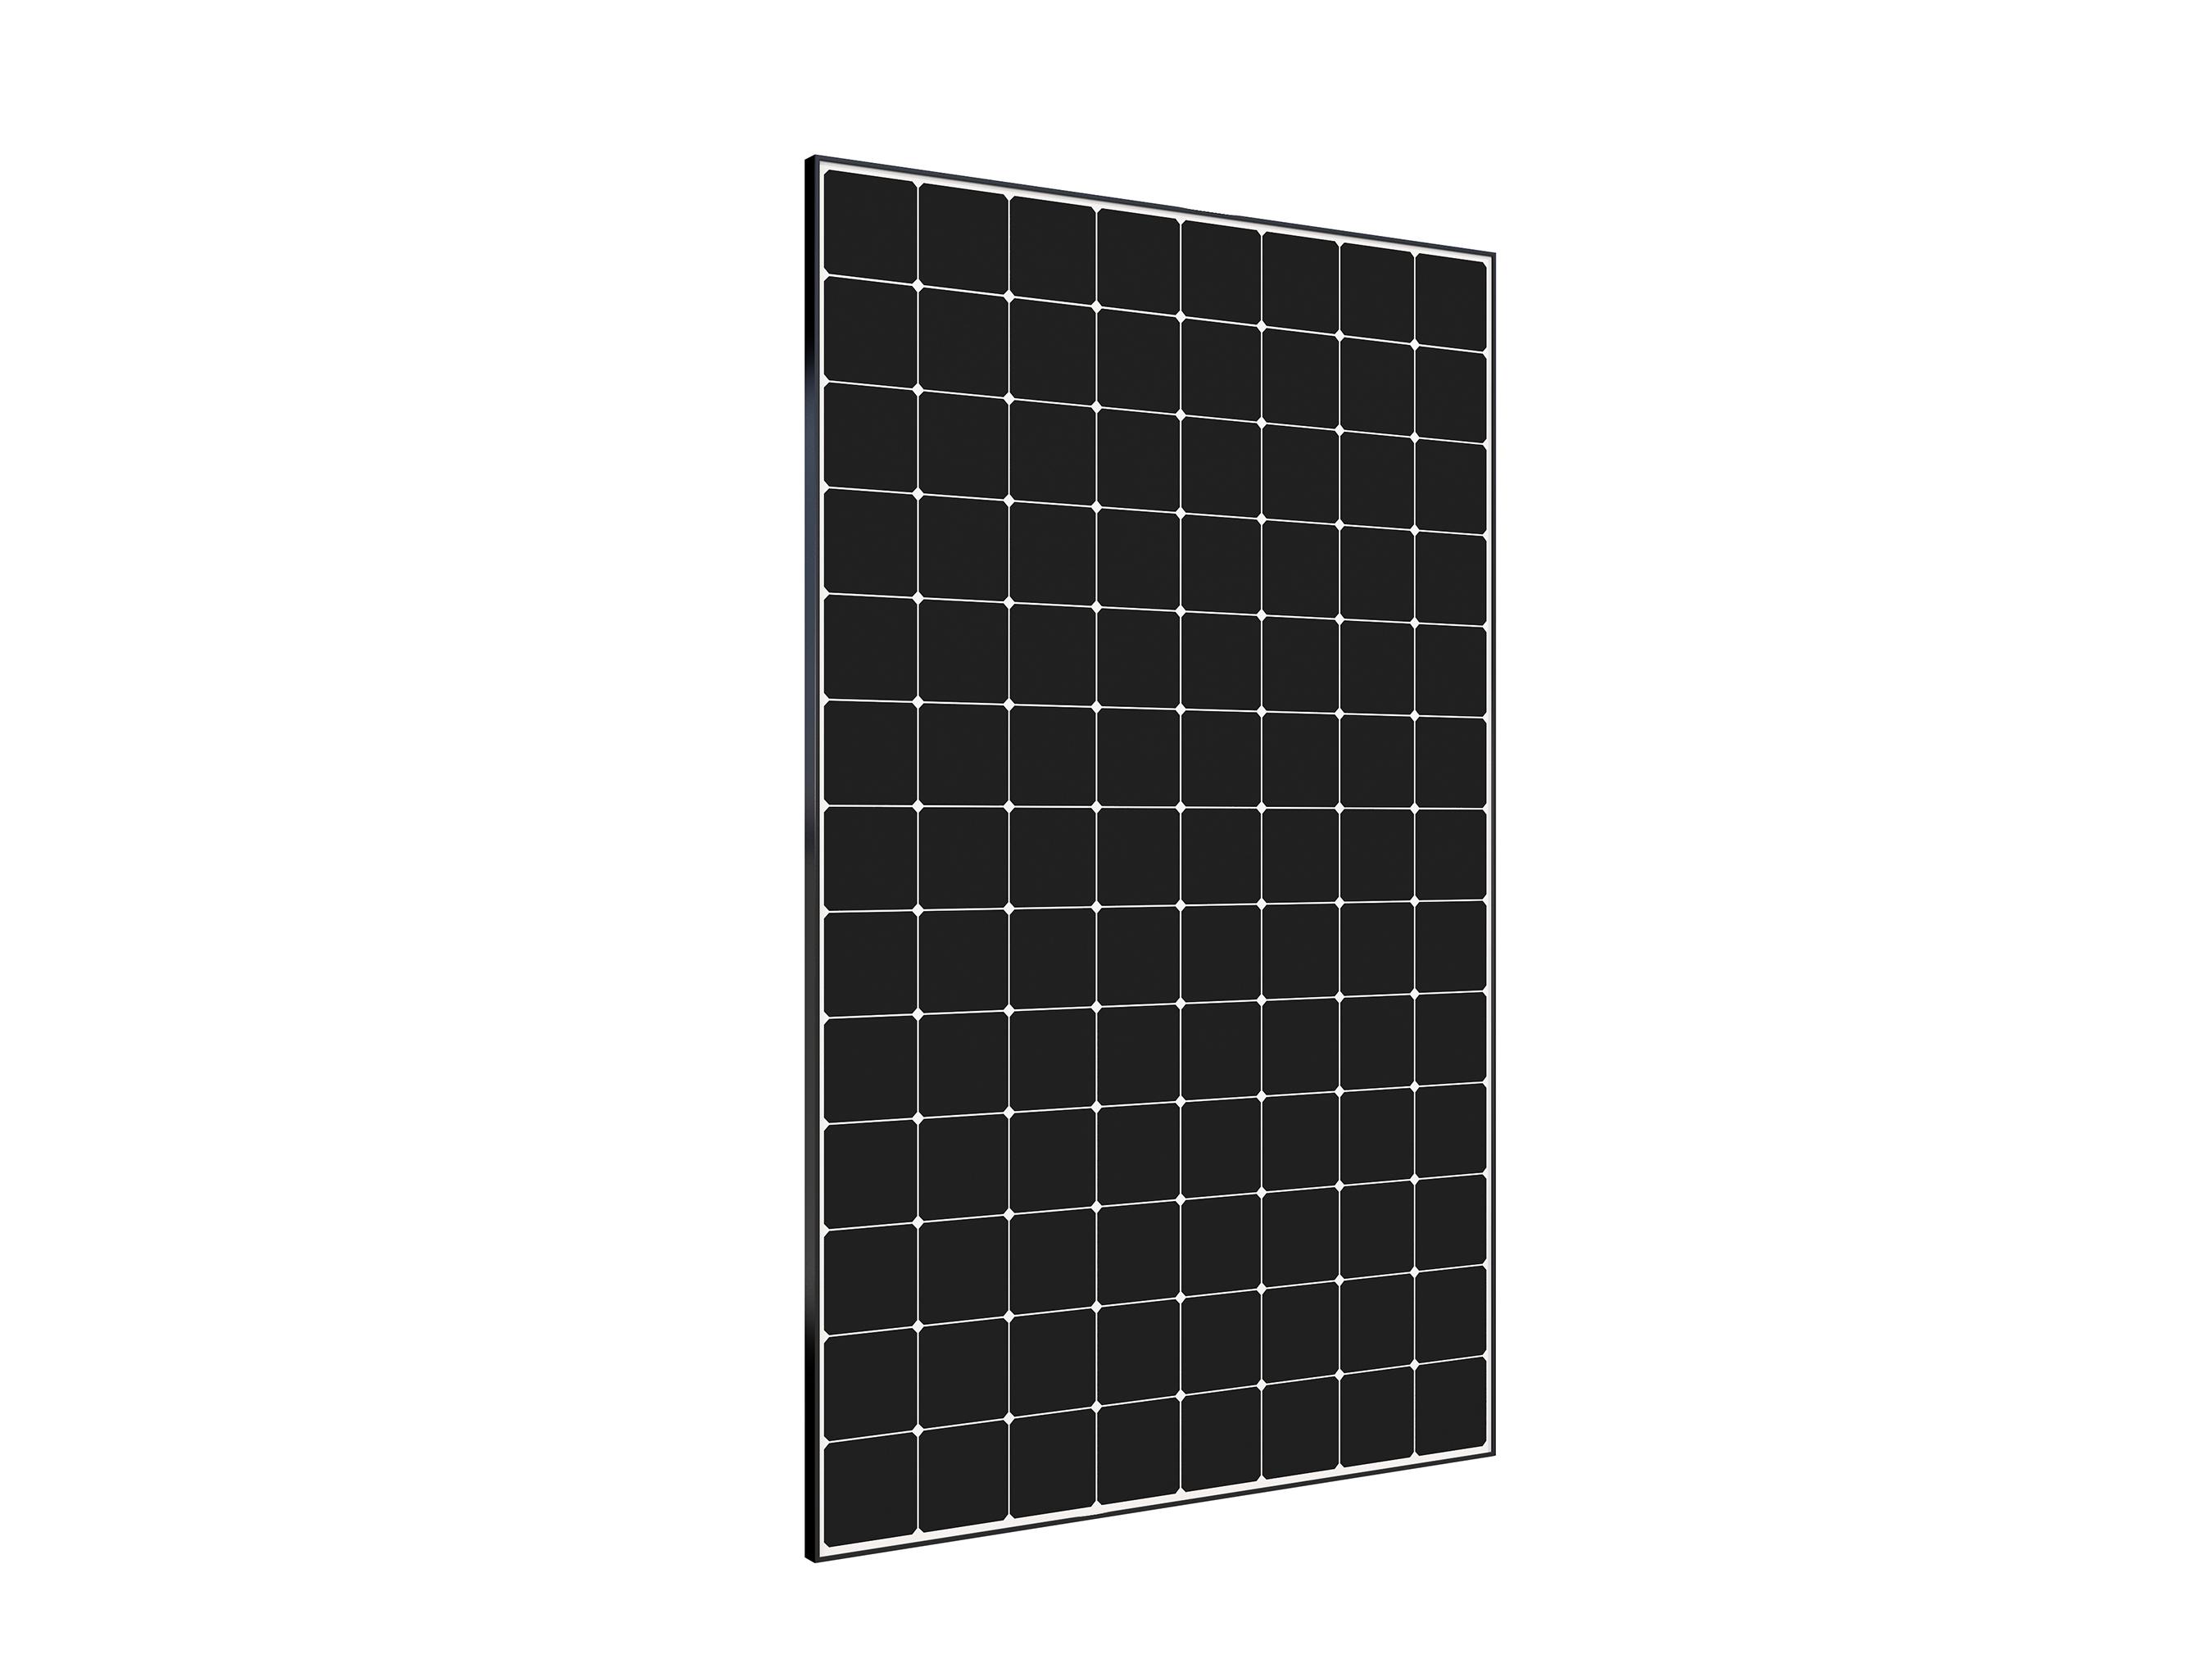 Sunpower 400 watt residential panels